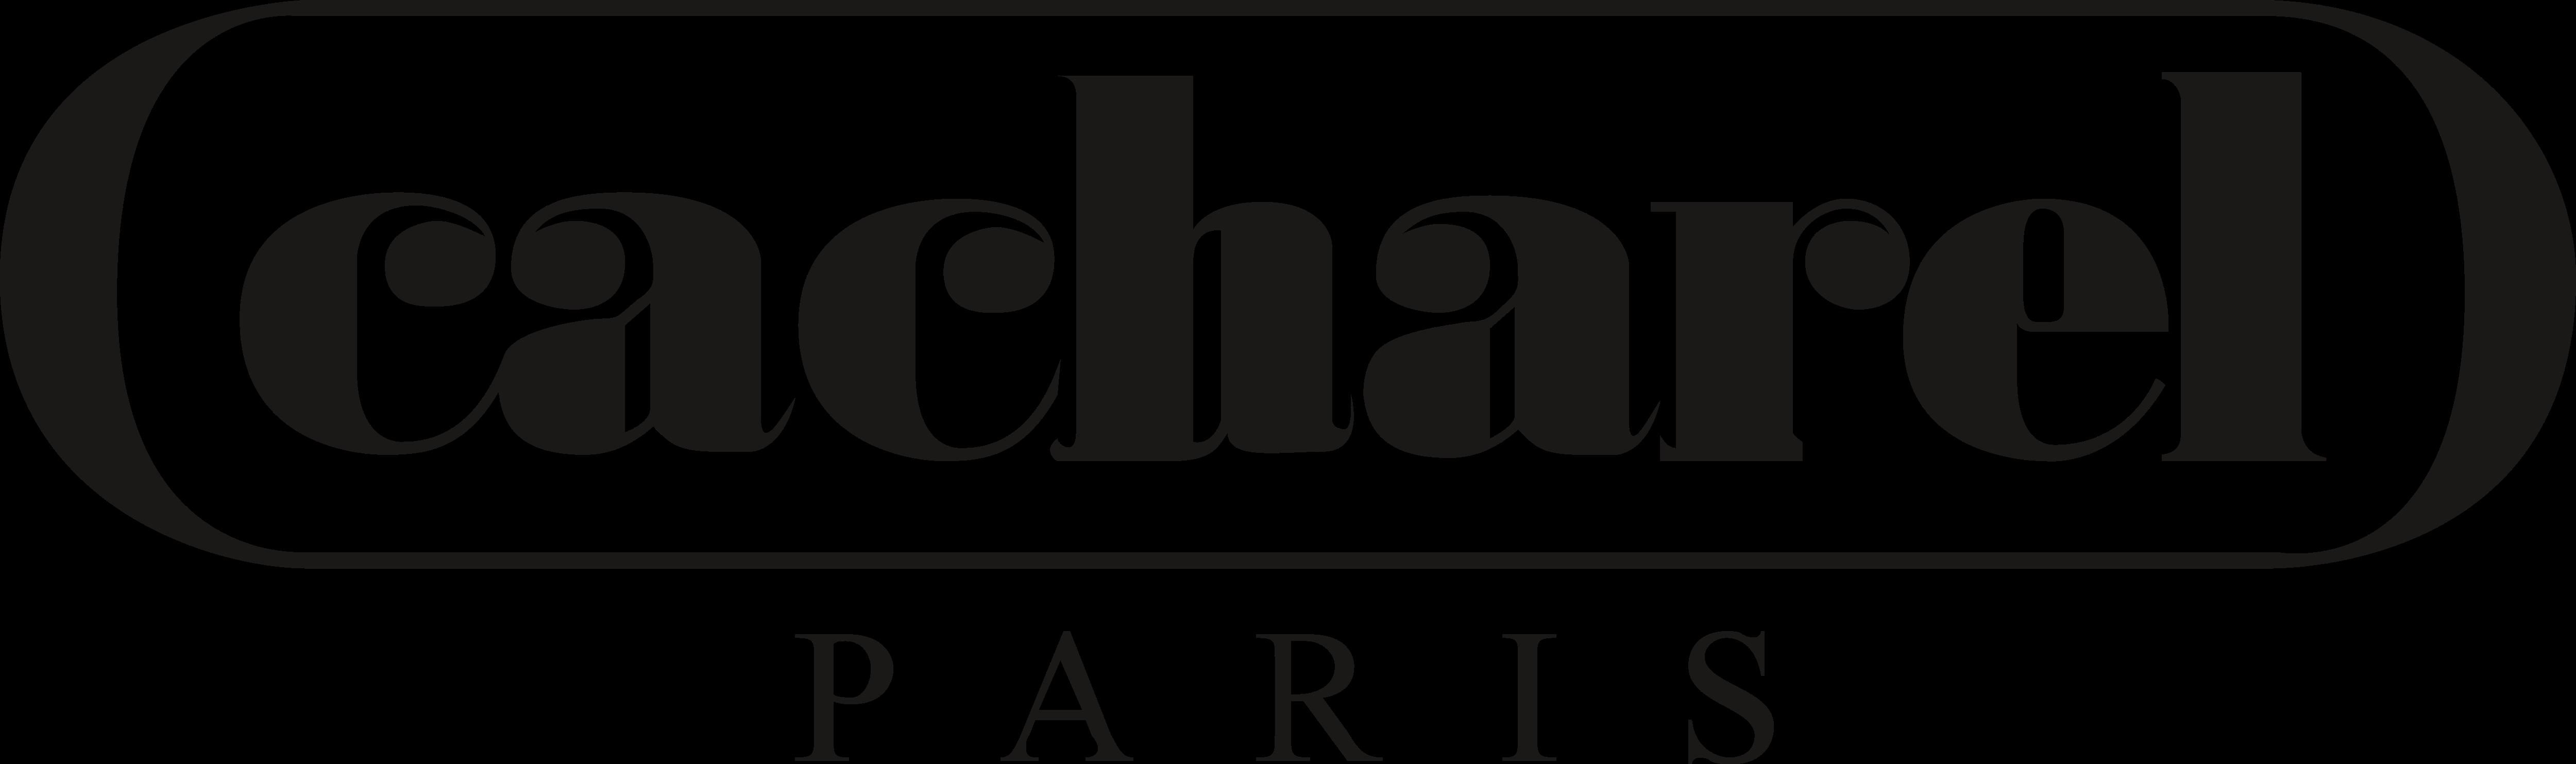 796cc43458 Cacharel – Logos Download